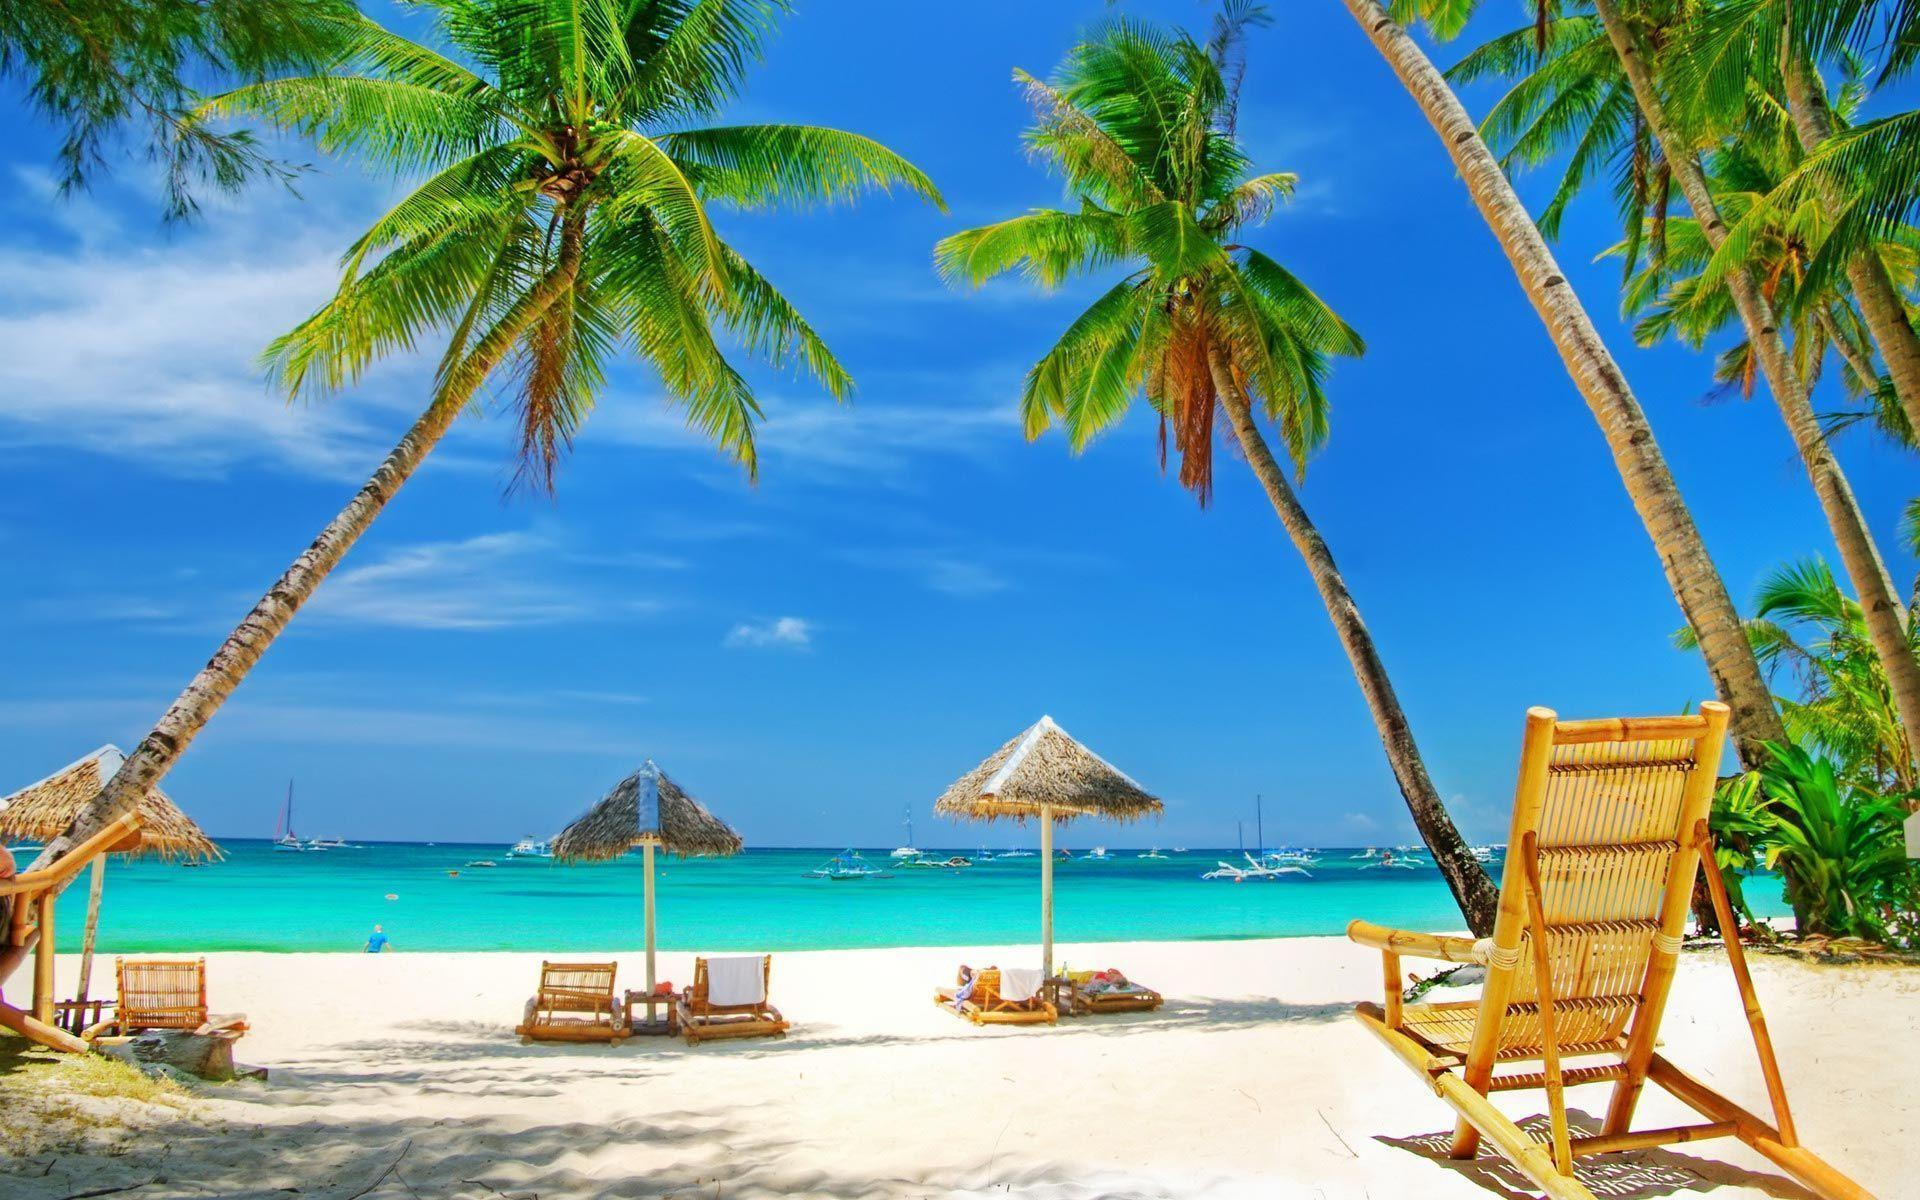 Hd Tropical Island Beach Paradise Wallpapers And Backgrounds: Free Tropical Wallpapers